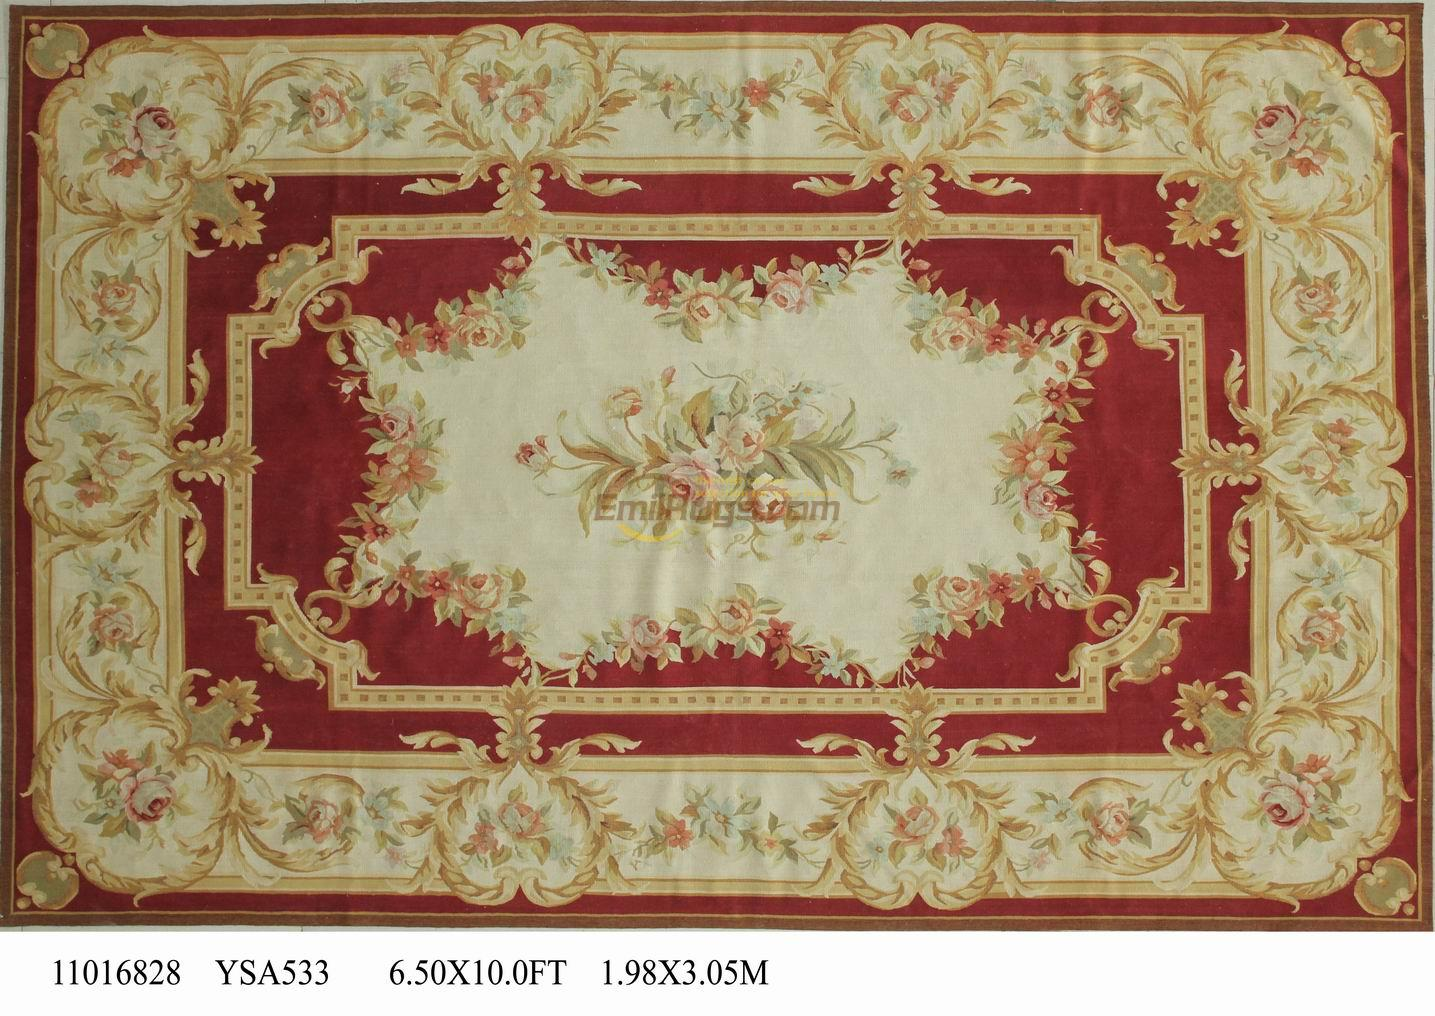 wool carpet french aubusson rugs 198cmx308cm 65u0027x 101u0027 camel large side blue - Aubusson Rugs